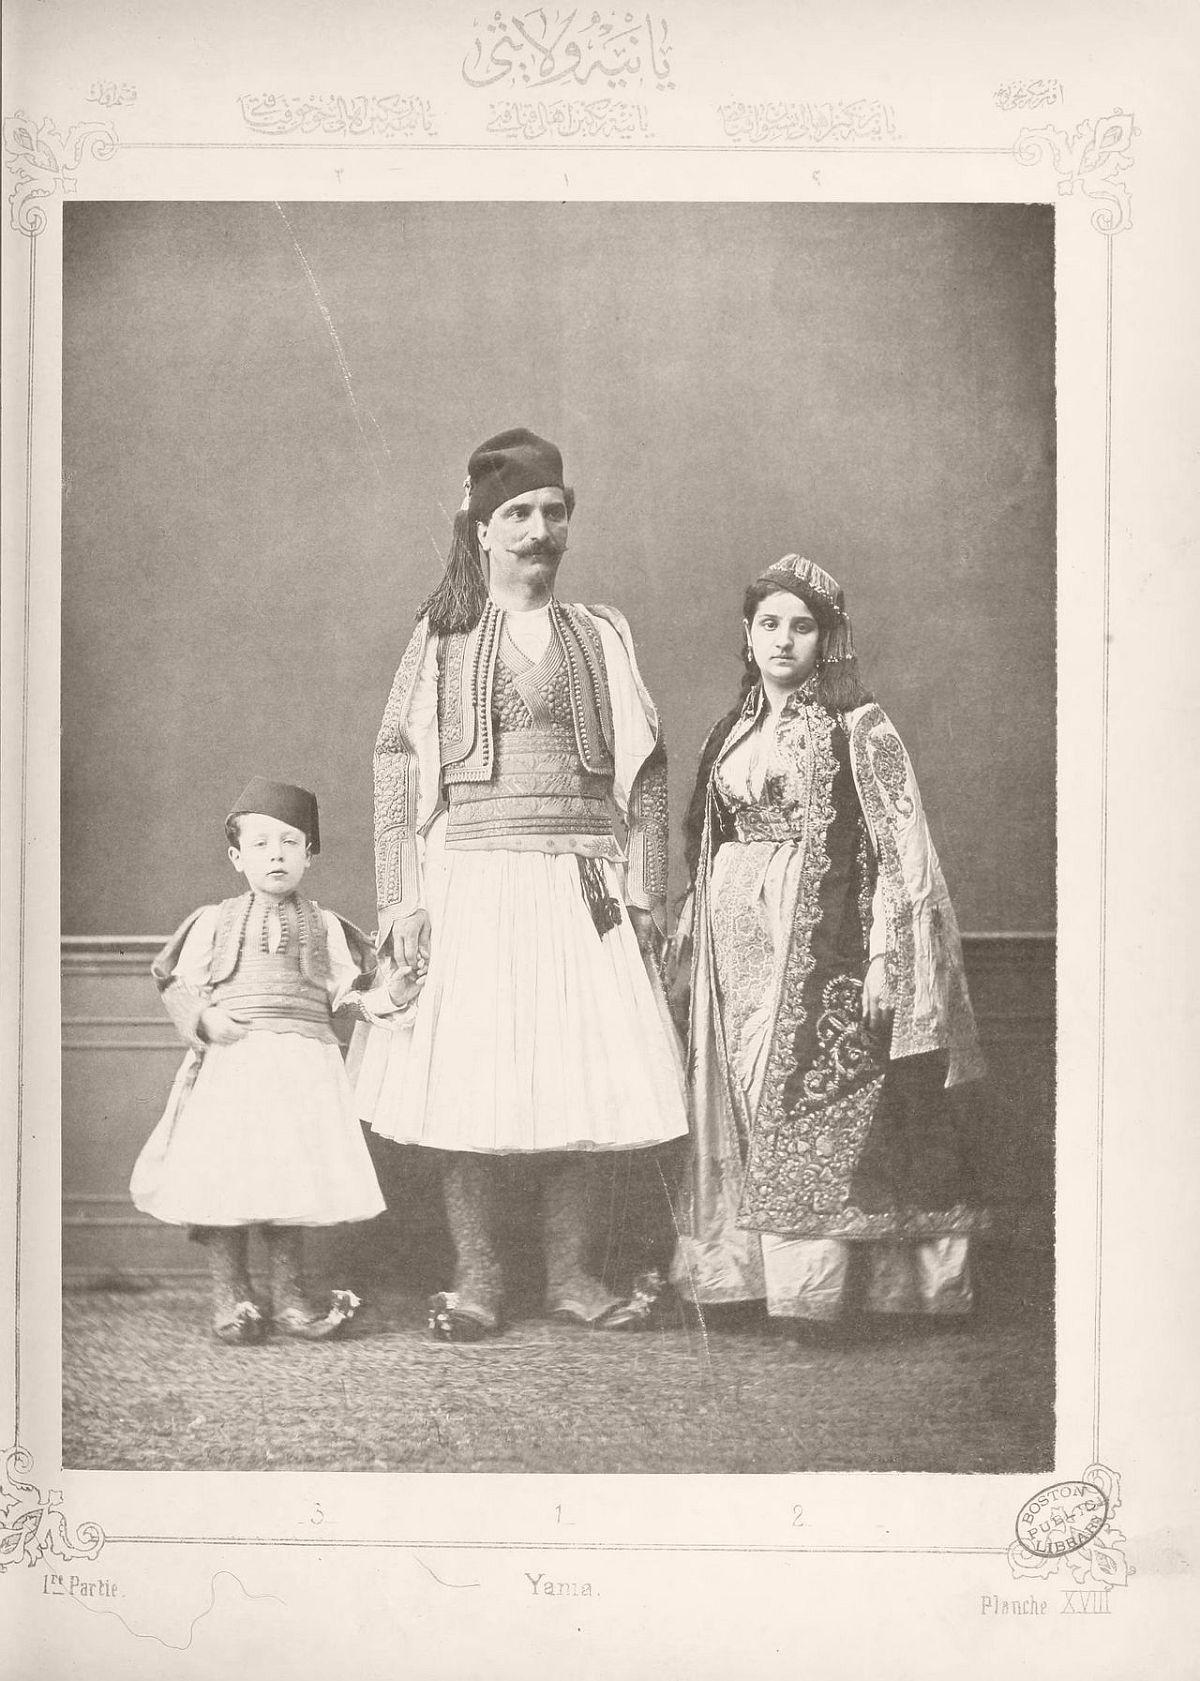 1: Wealthy Arnaut from Ioannina 2. Wealthy Arnaut lady from Ioannina 3. Arnaut child of a wealthy family.